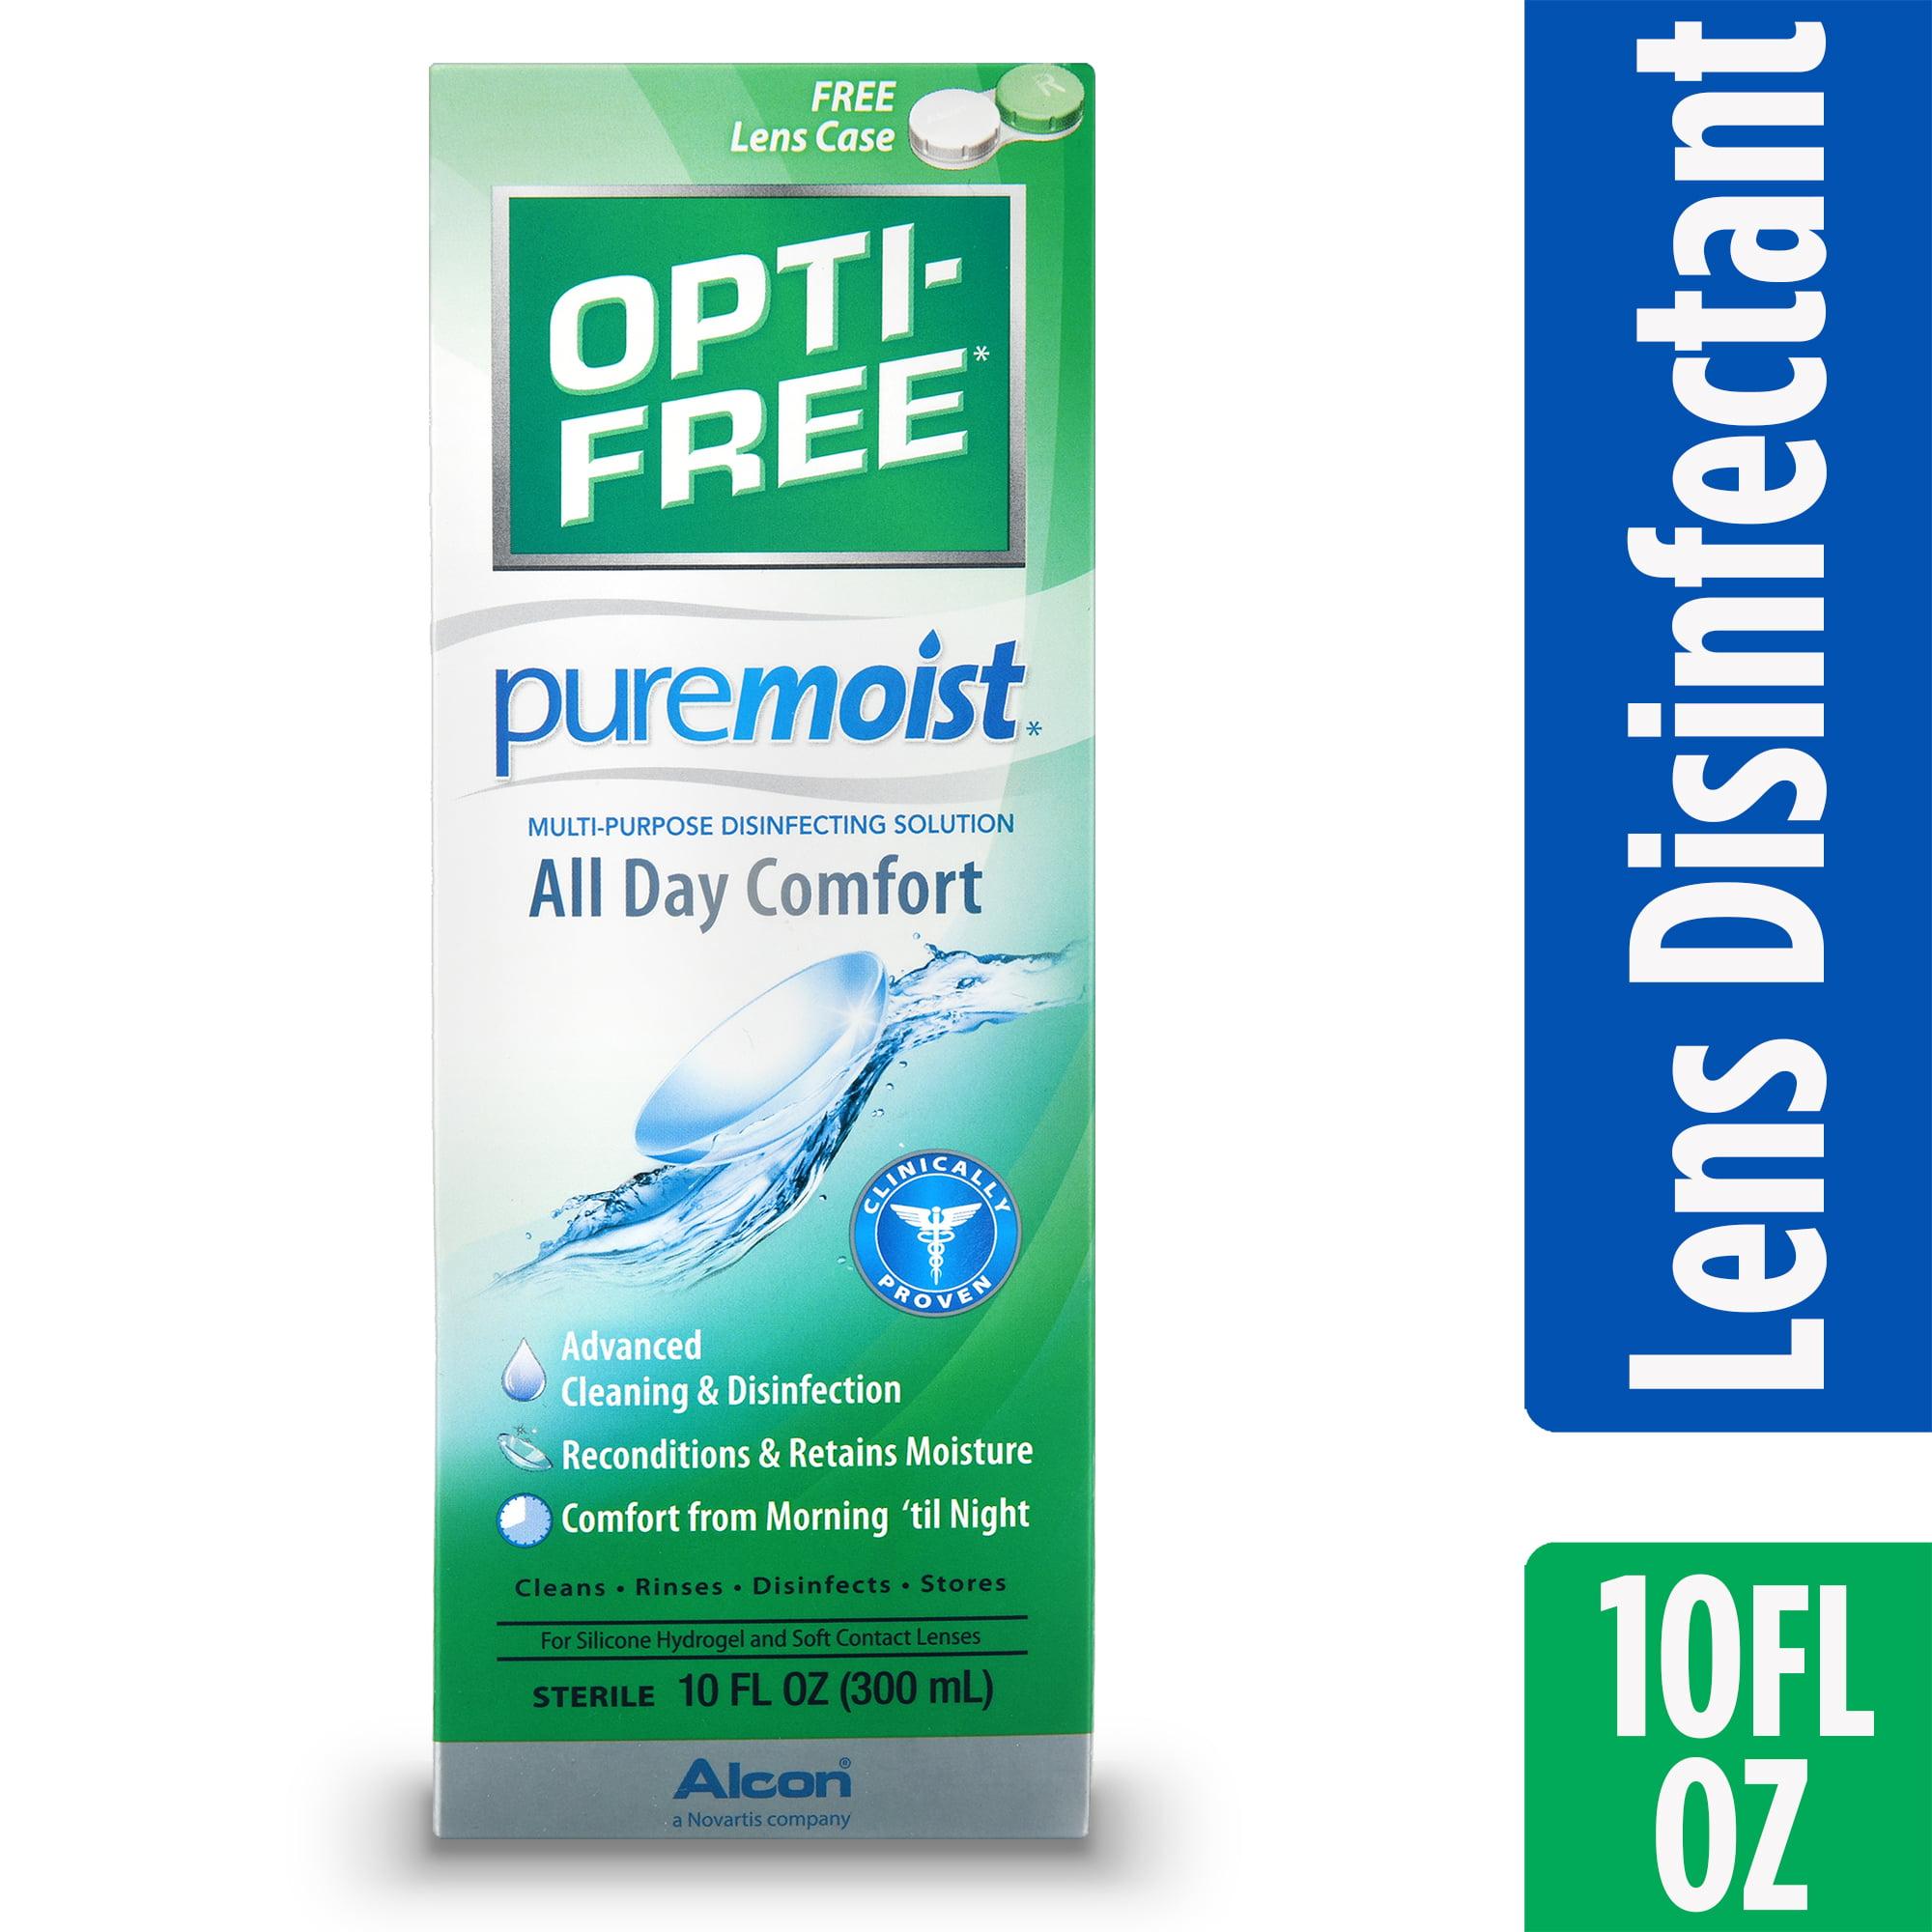 OPTI-FREE Puremoist Multipurpose Contact Lens Disinfecting Solution, 10 Fl. Oz.